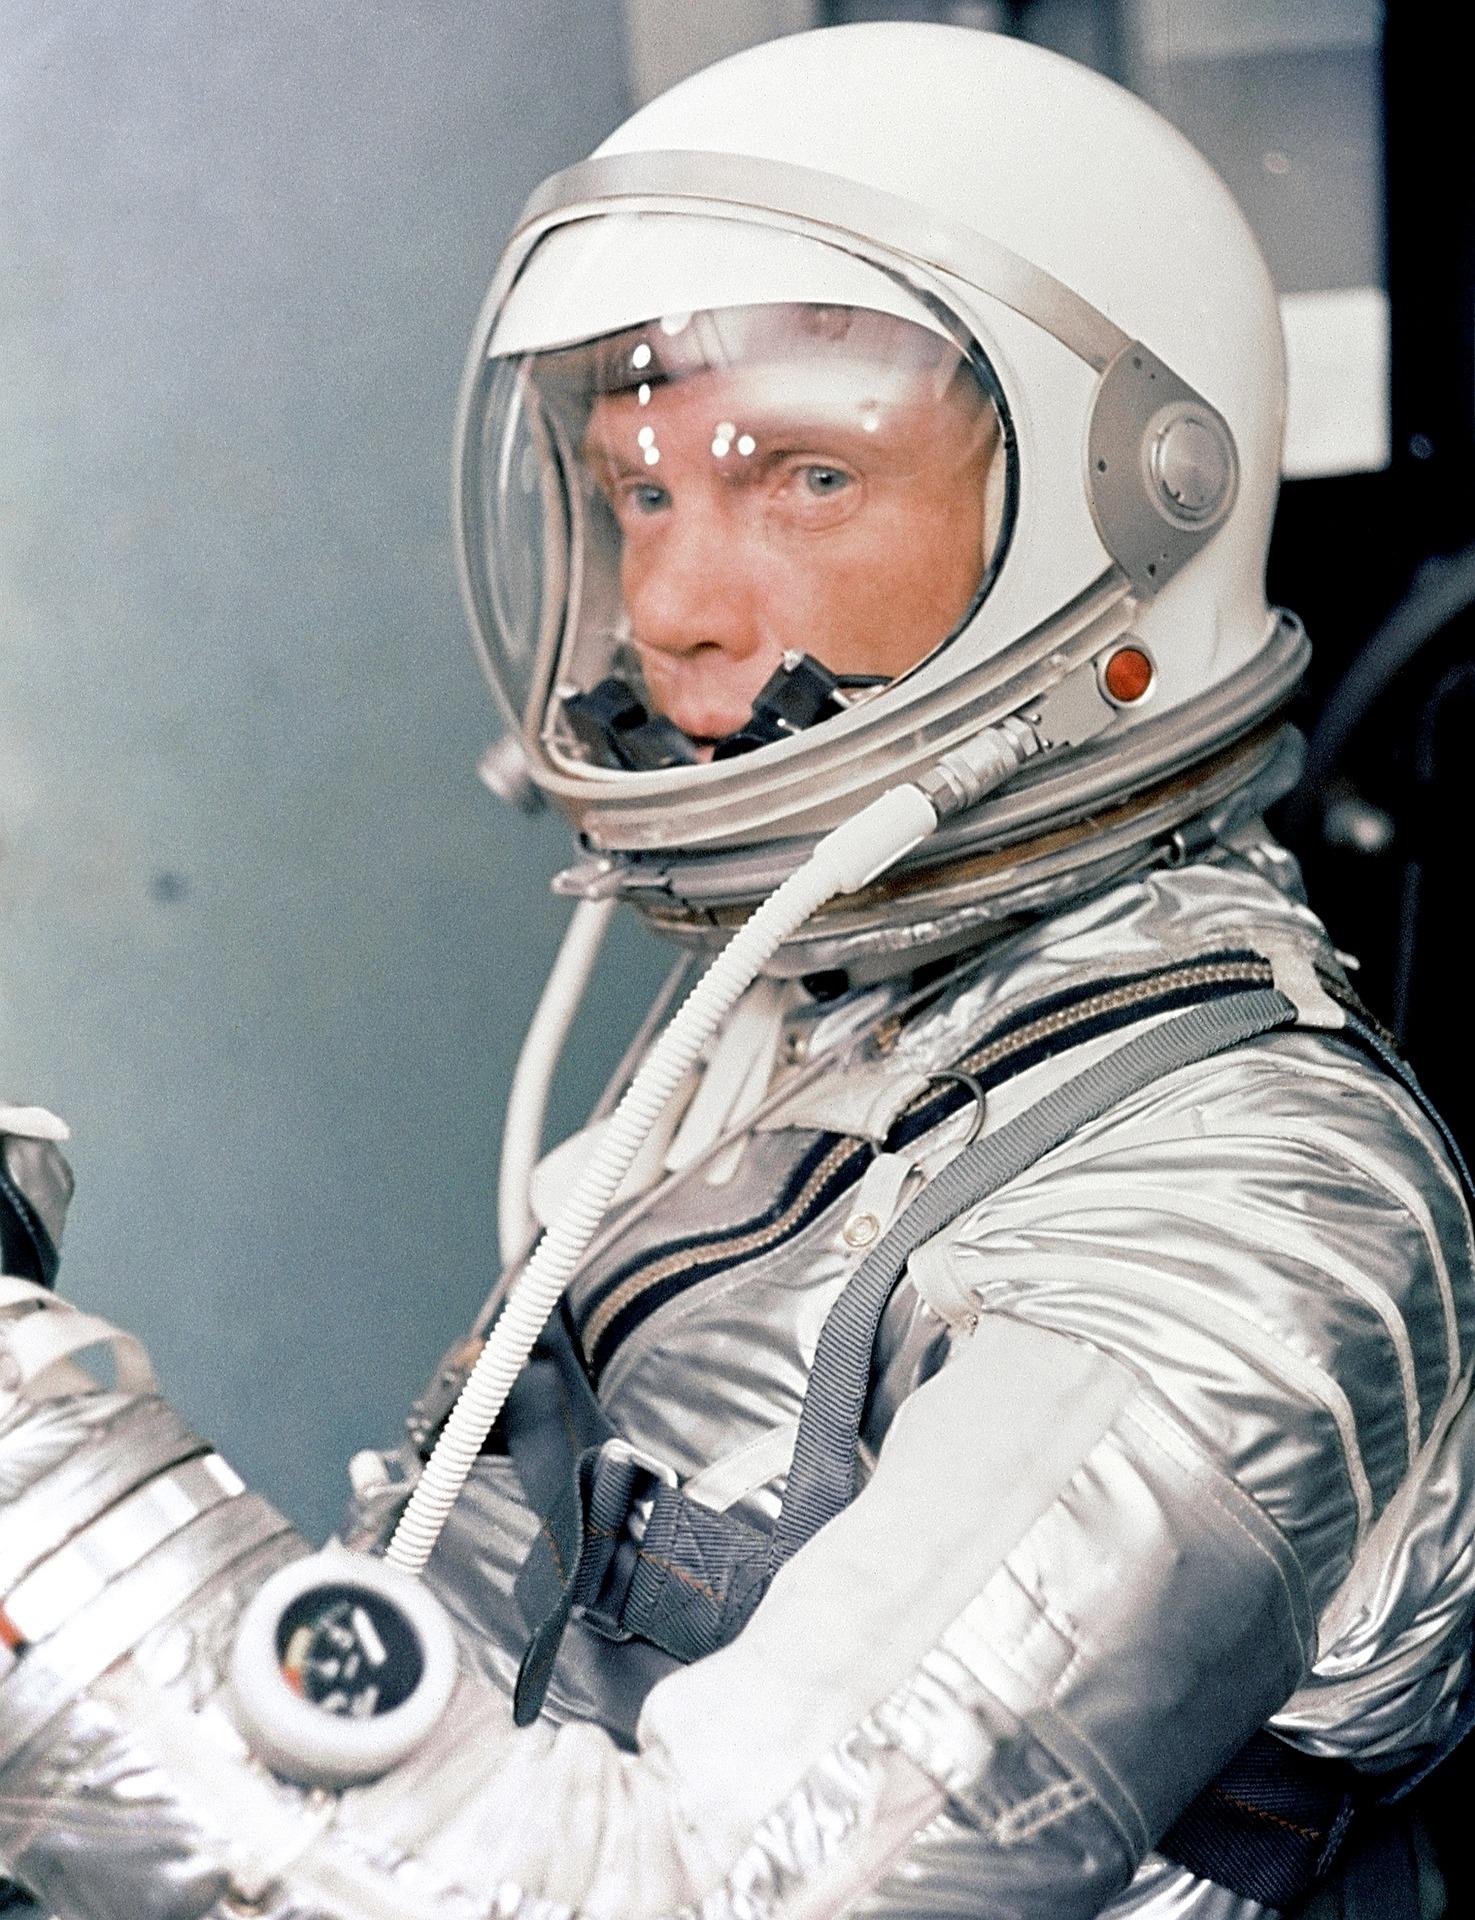 John Glenn in Astronaut Gear